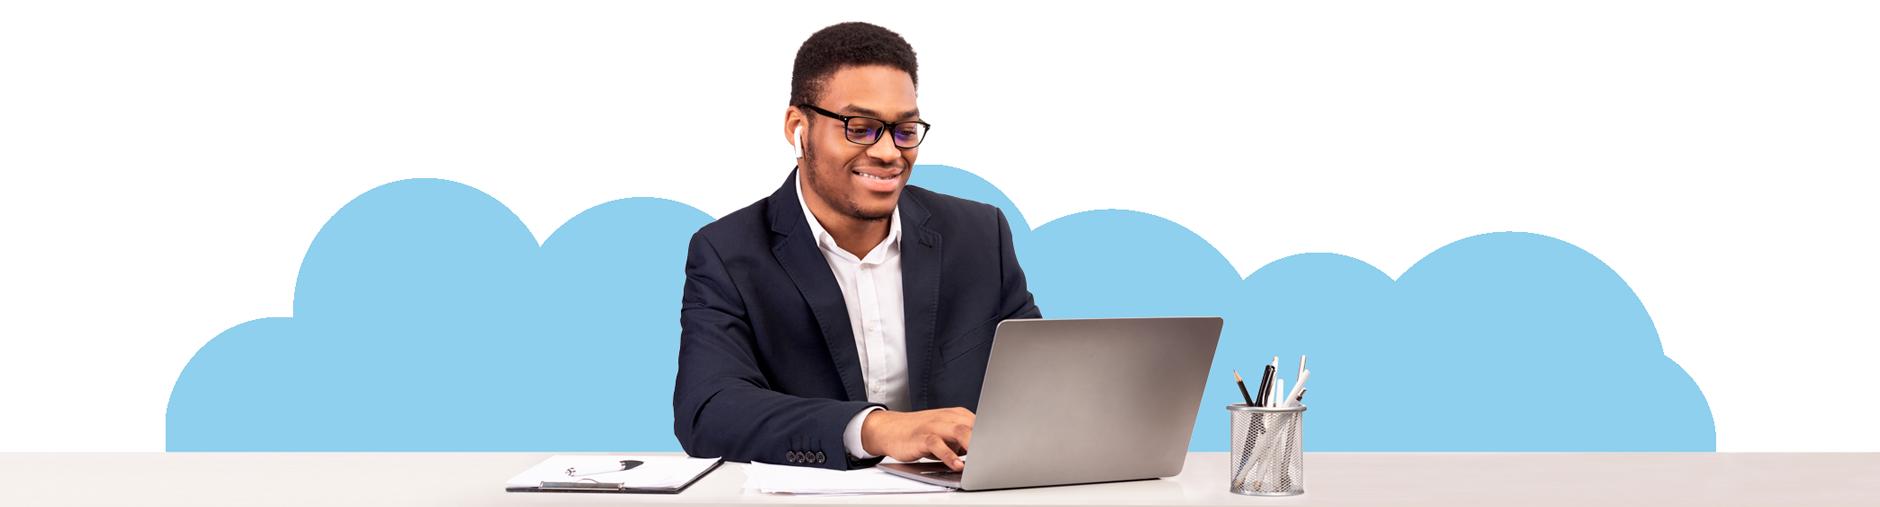 un empresario usando brainbooks